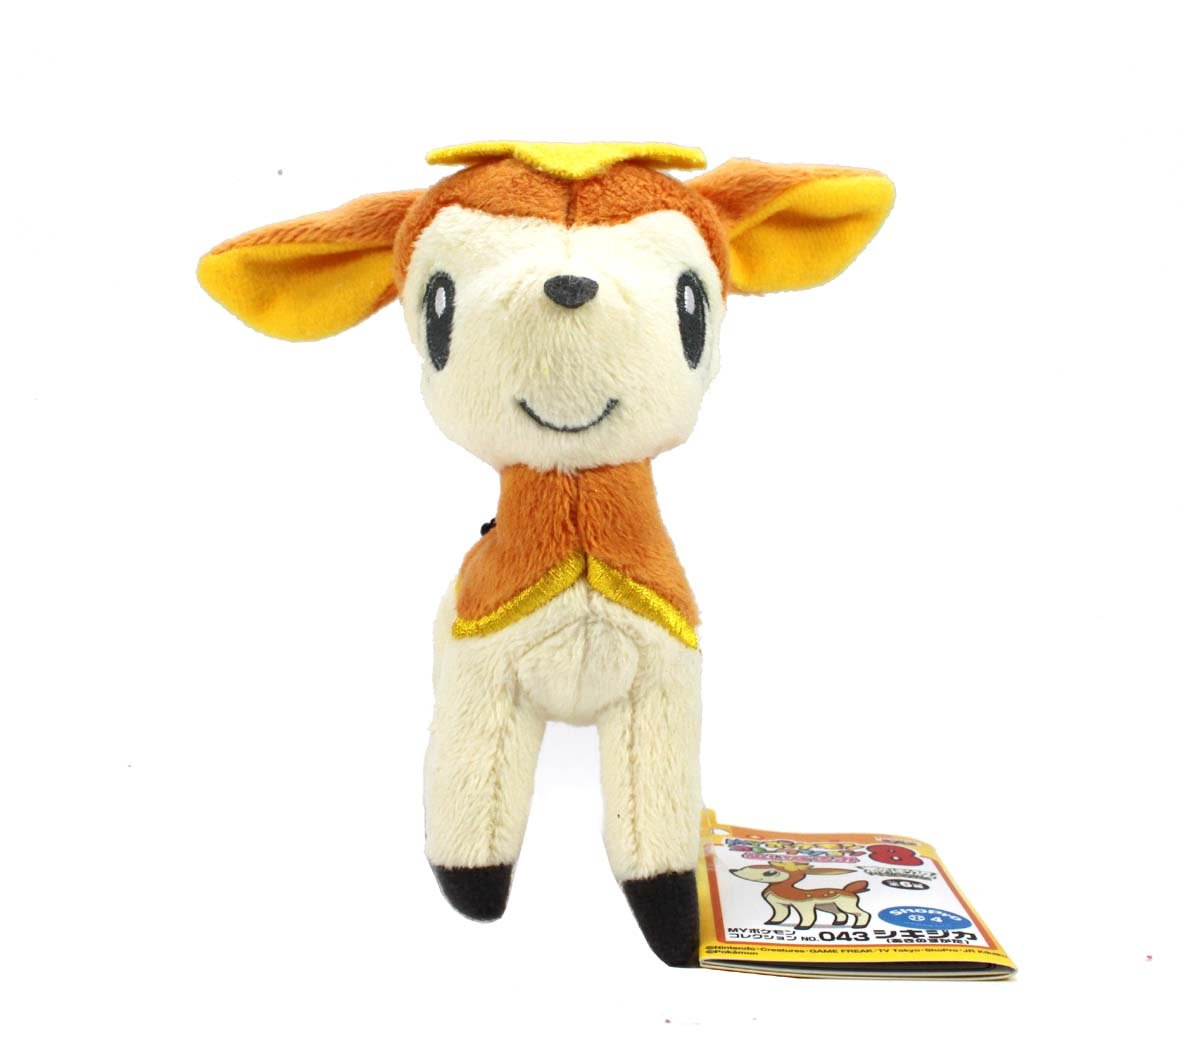 Banpresto My Pokemon Collection Best Wishes Mini Plush 47488-5 Autumn Orange Deerling//Shikijika Japan VideoGames PL-097418